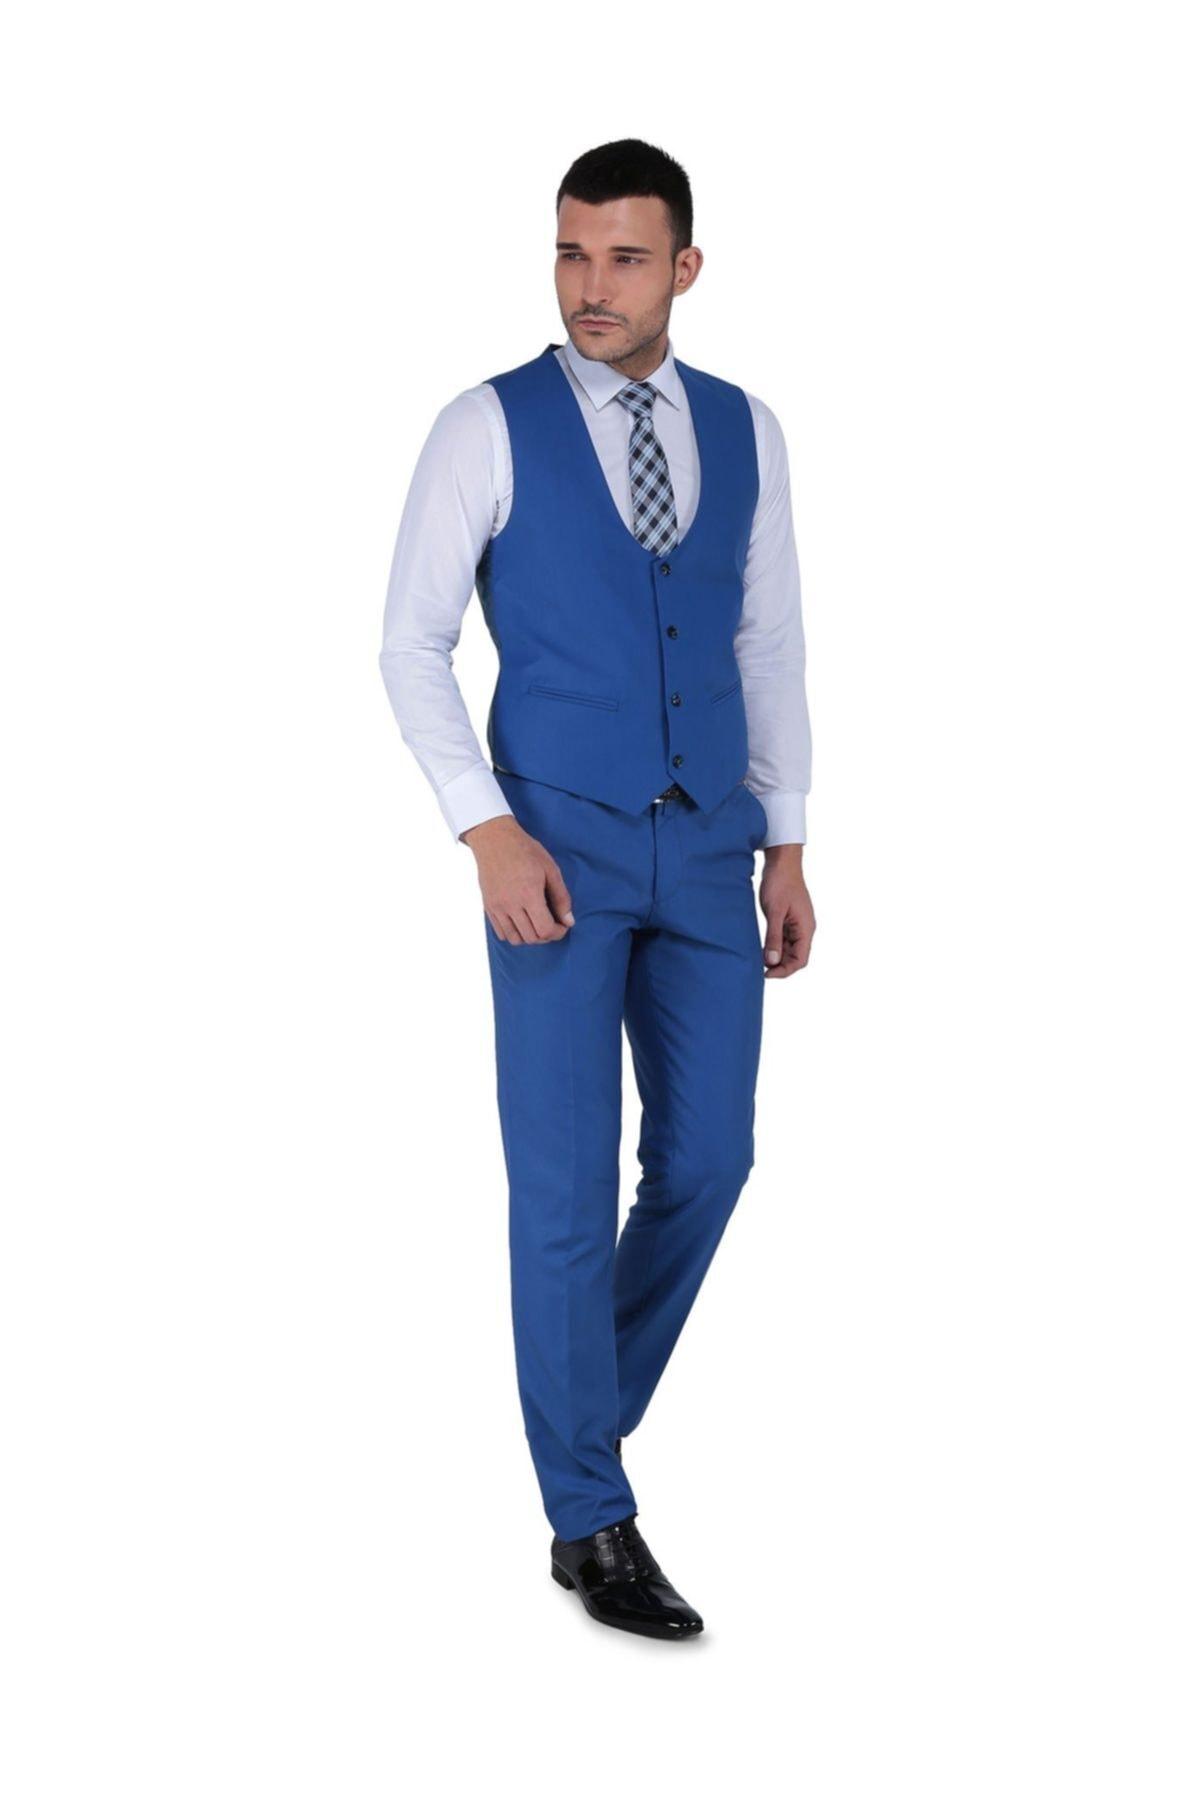 Buenza Erkek Akf Mono Yelekli Dar Kalıp Takım Elbise 2